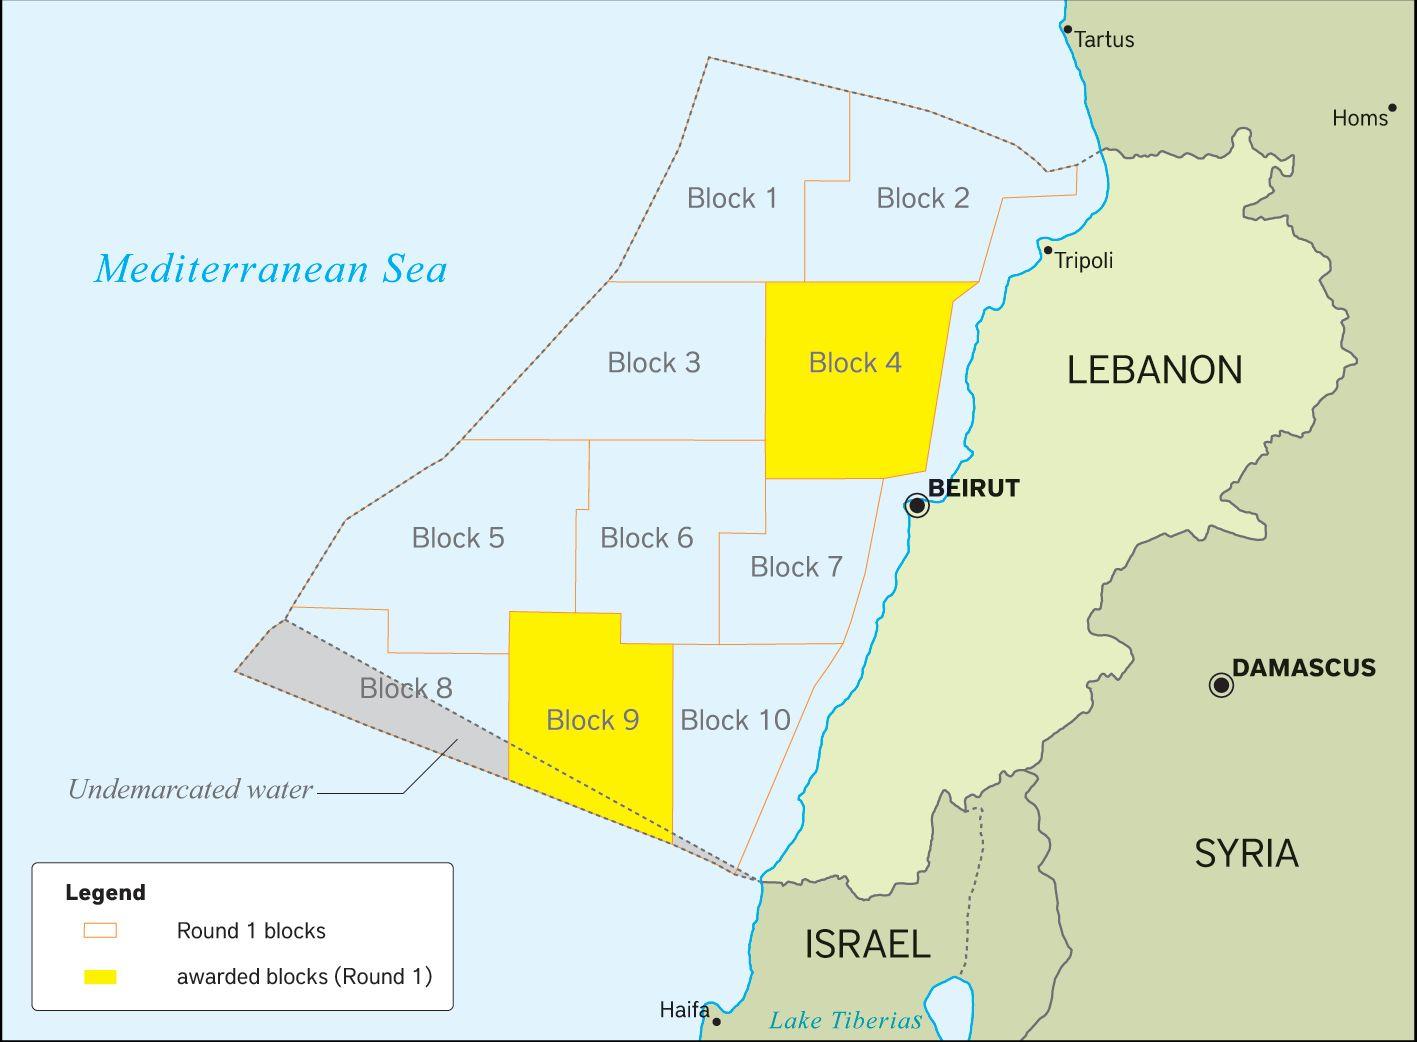 Lebanon's Dep C-of-S Brig, Yassin to lead maritime talks with Israel